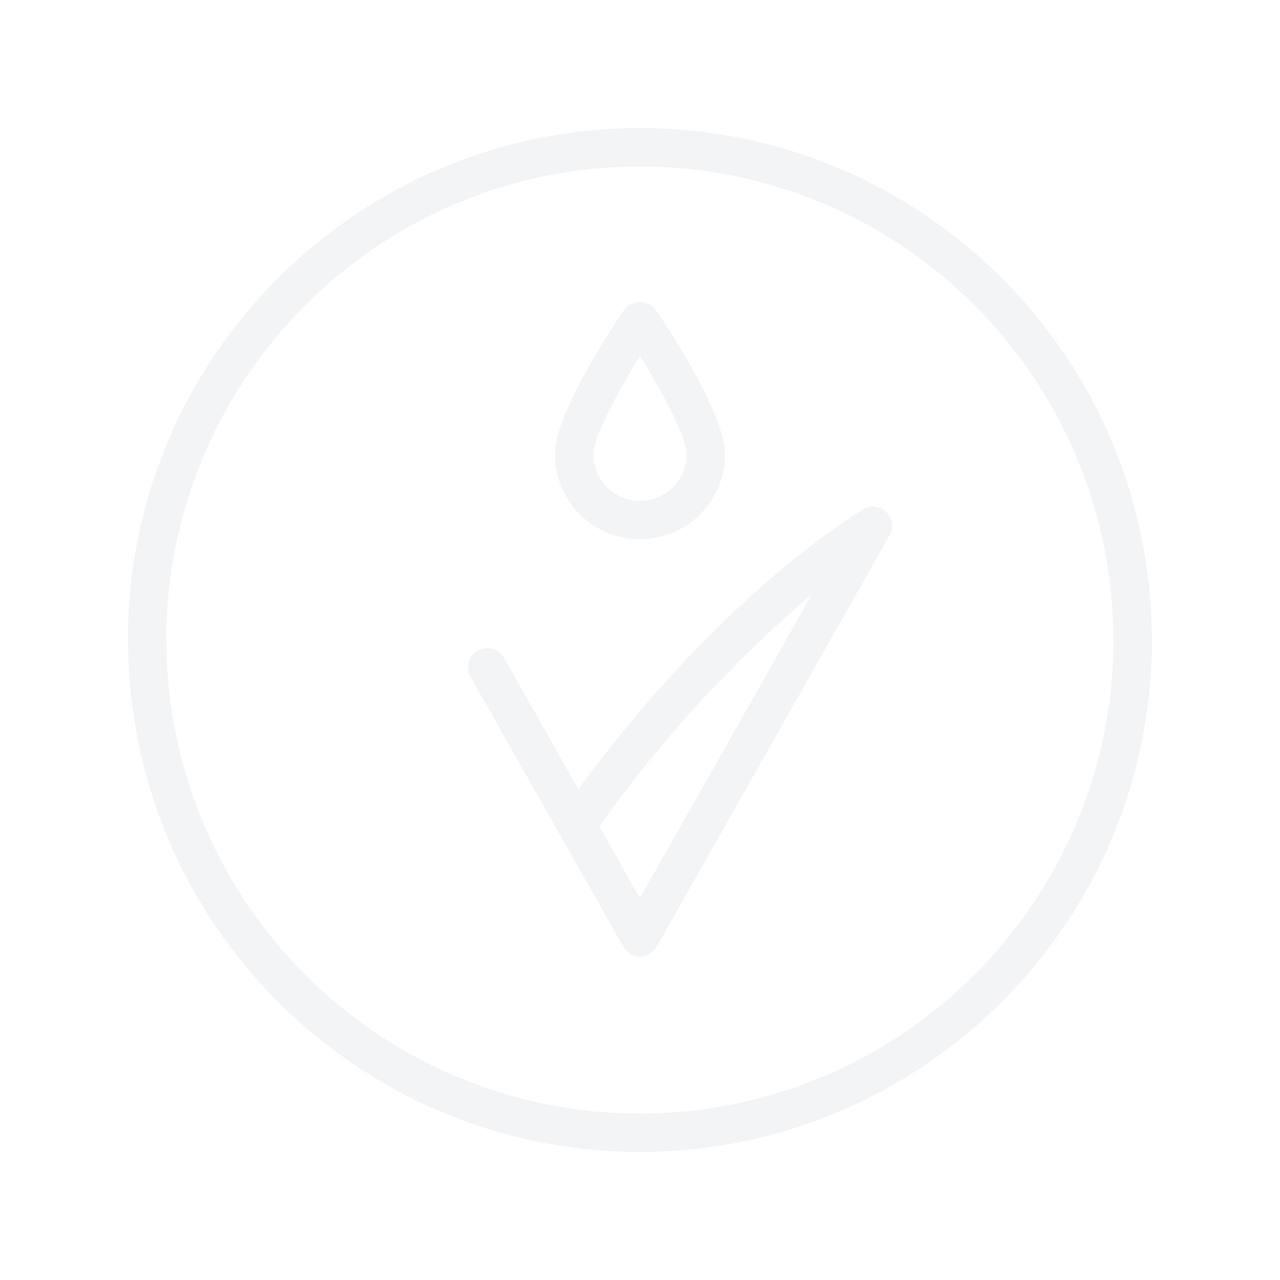 PRADA L'Homme Deodorant Stick 75ml